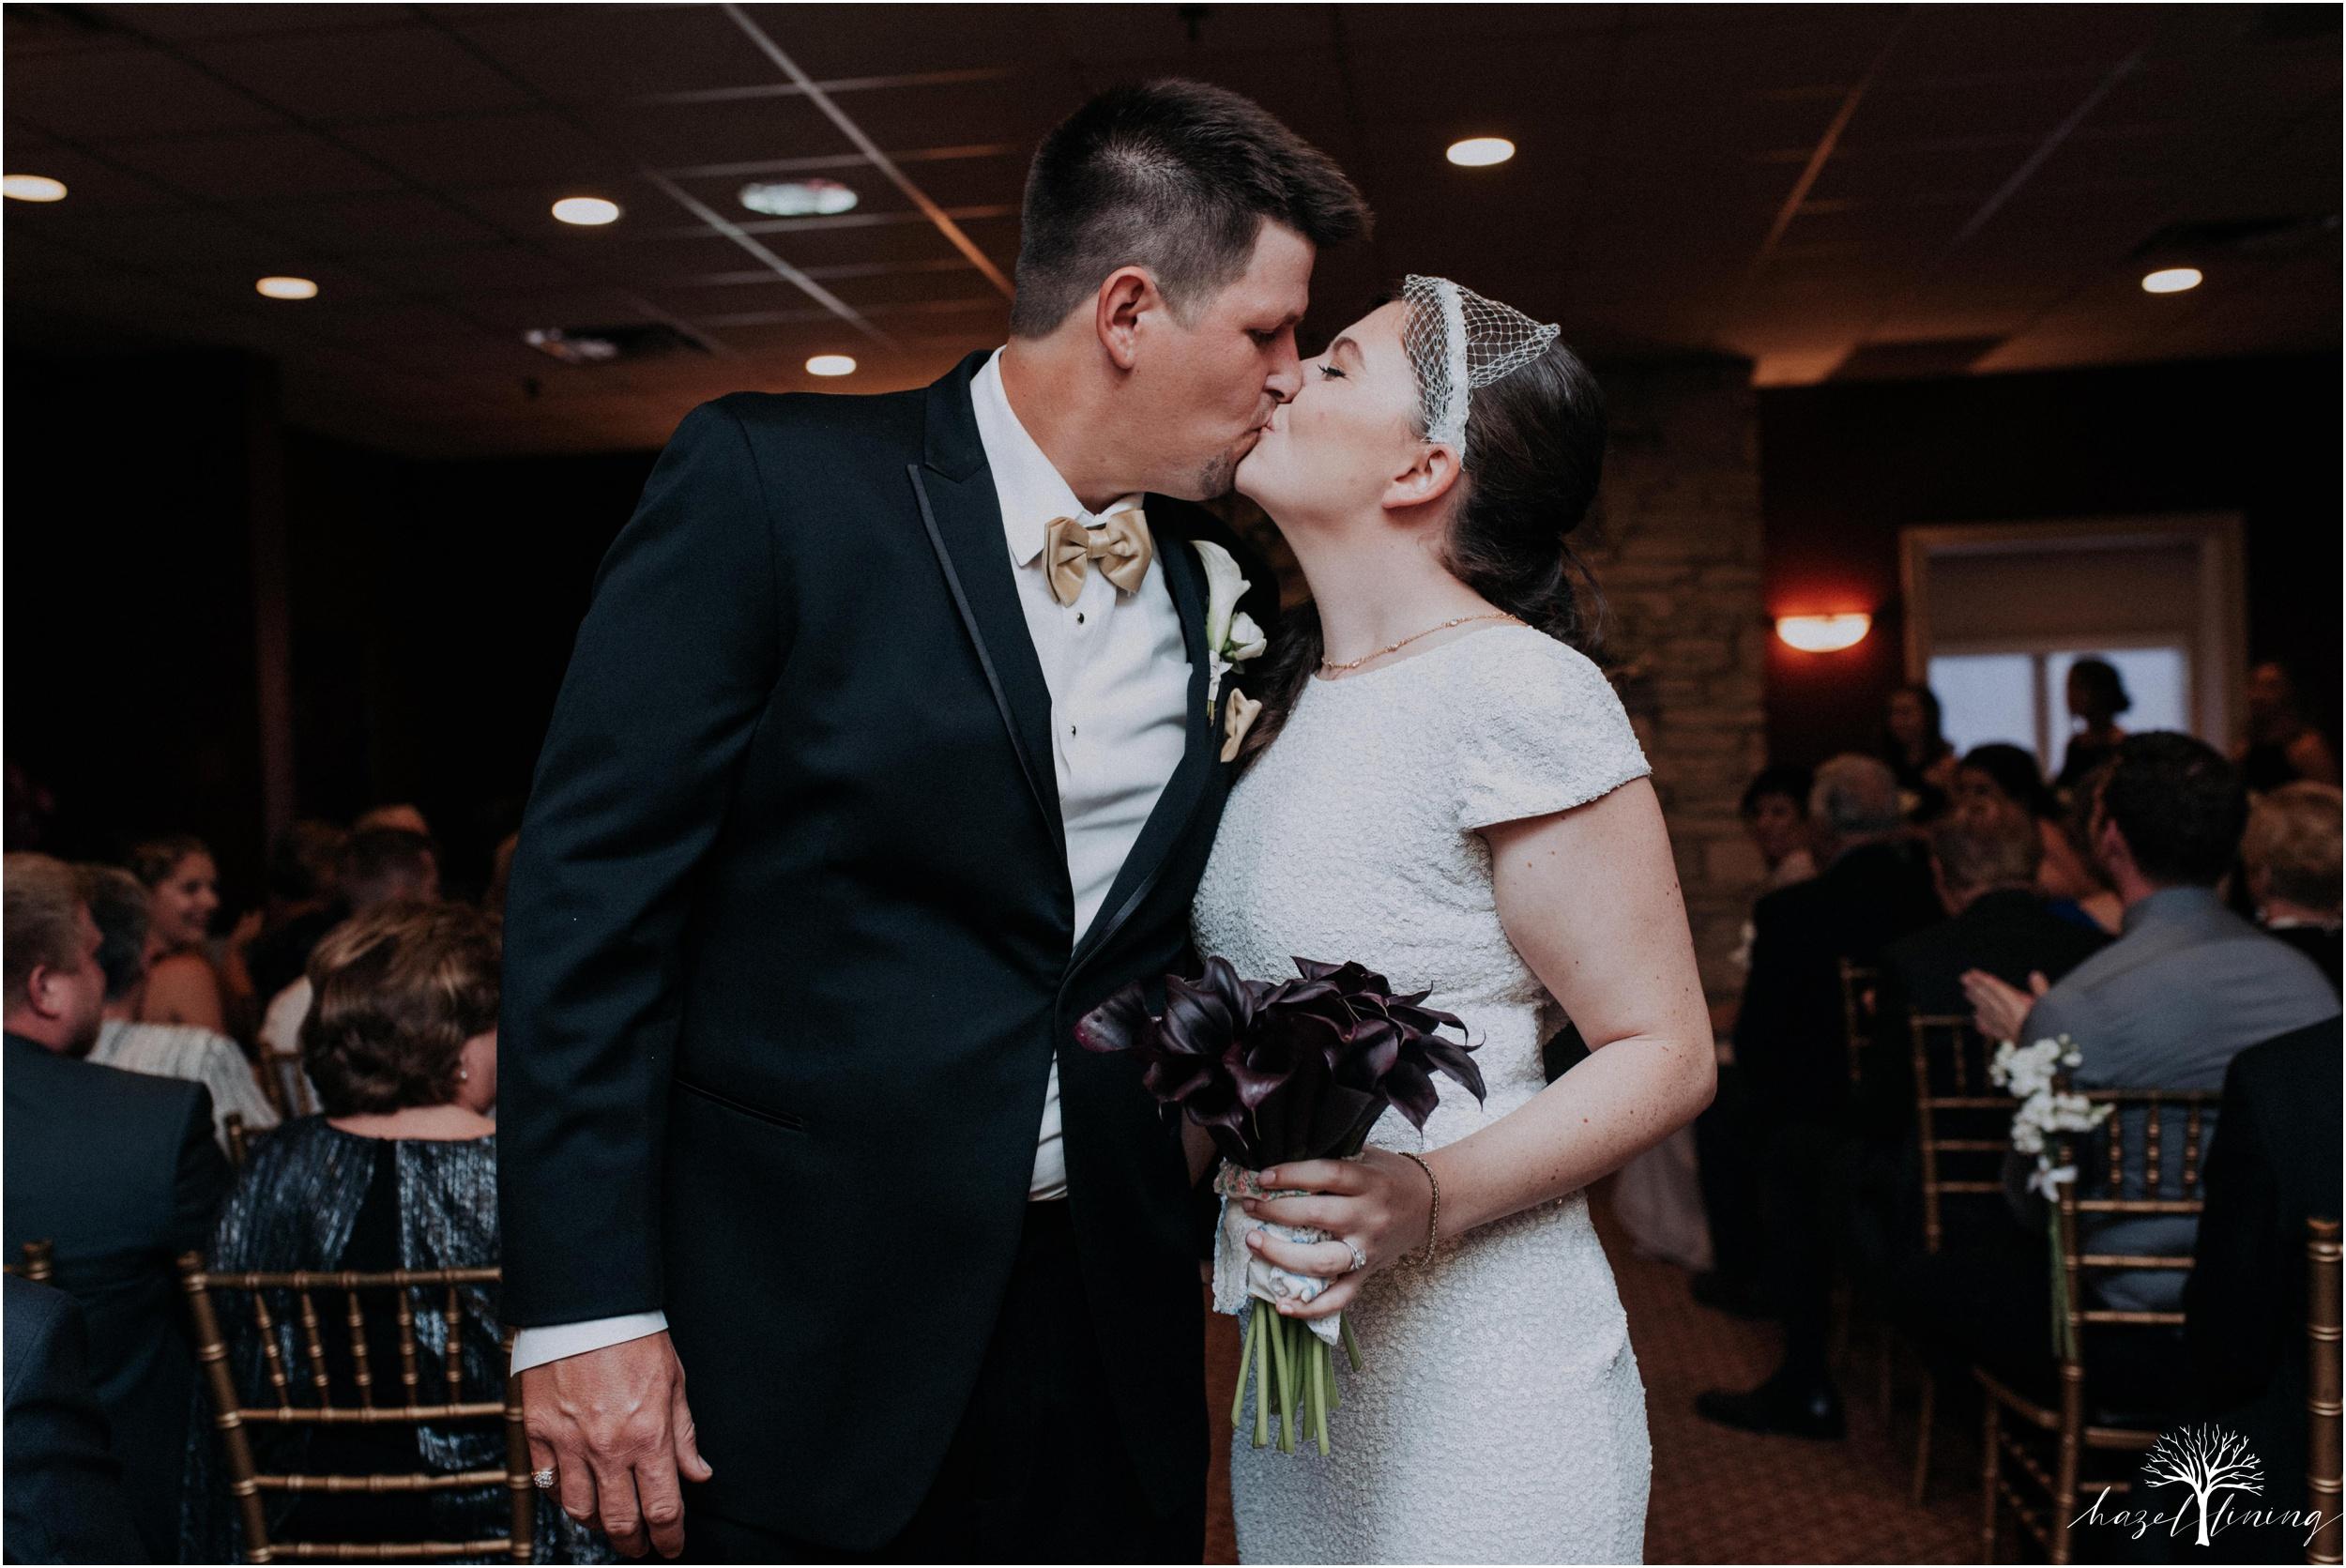 elizabeth-doelp-andrew-foreback-middletown-country-club-summer-langhorne-pennsylvania-wedding-hazel-lining-travel-wedding-elopement-photography_0119.jpg